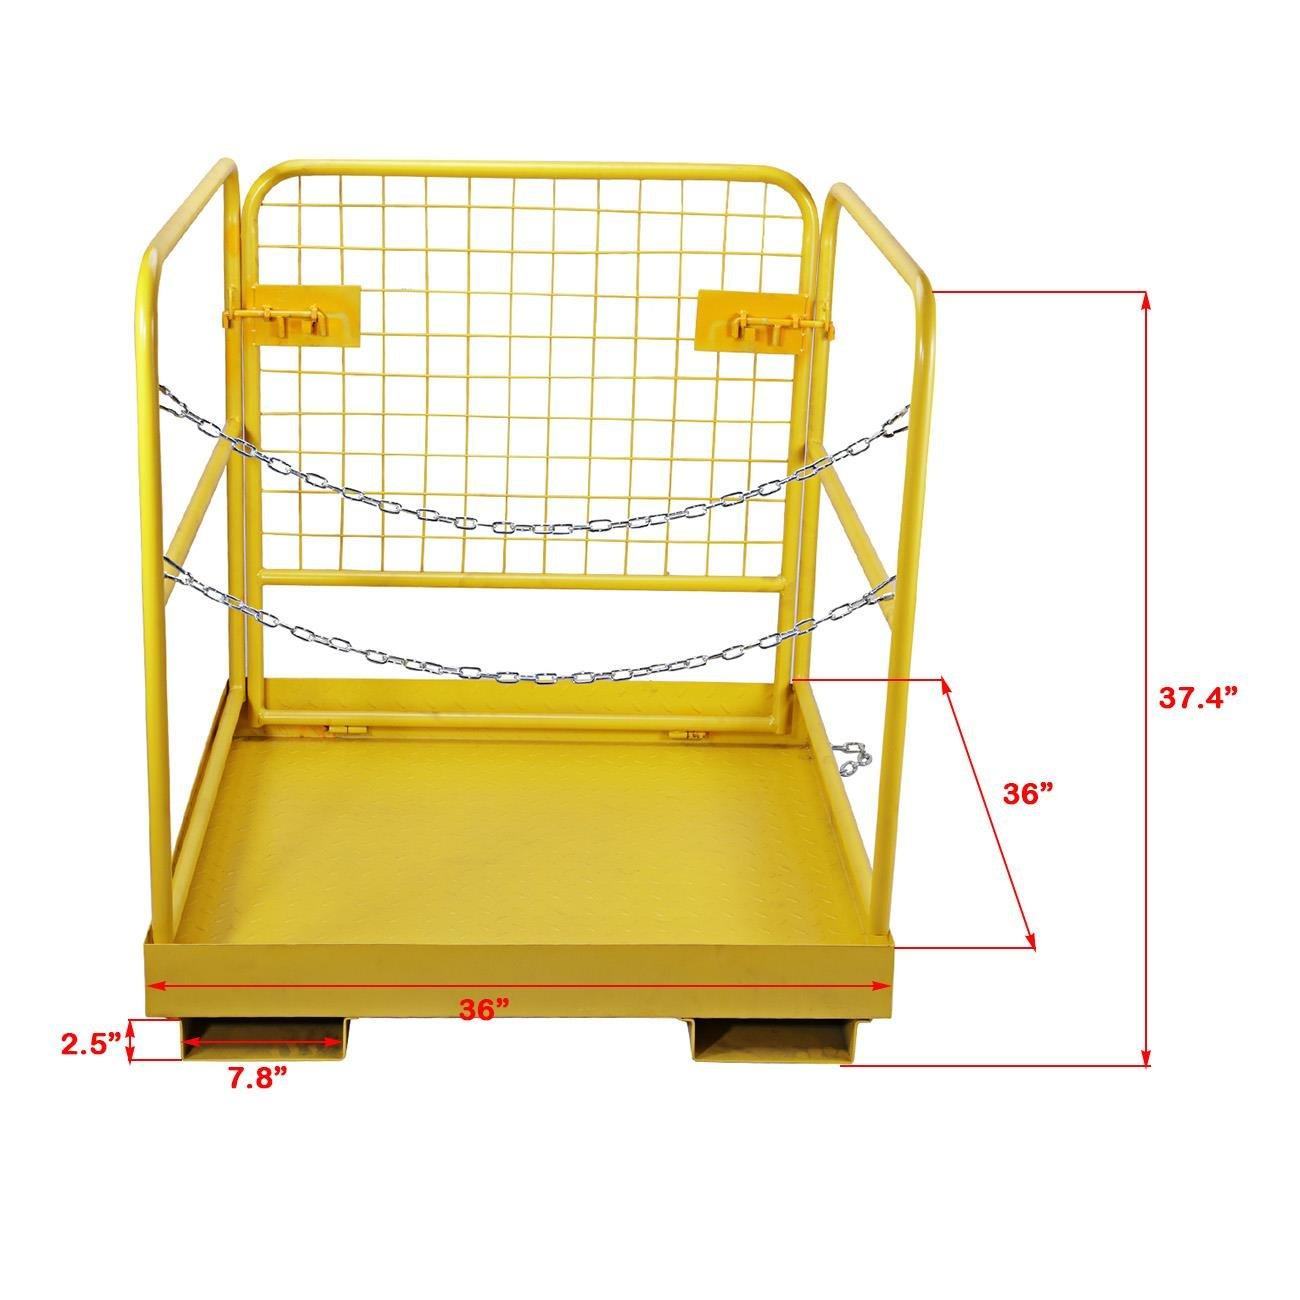 BEAMNOVA Forklift Safety Cage Work Platform Collapsible Lift Basket Aerial Rails 36''x36'' by BEAMNOVA (Image #1)